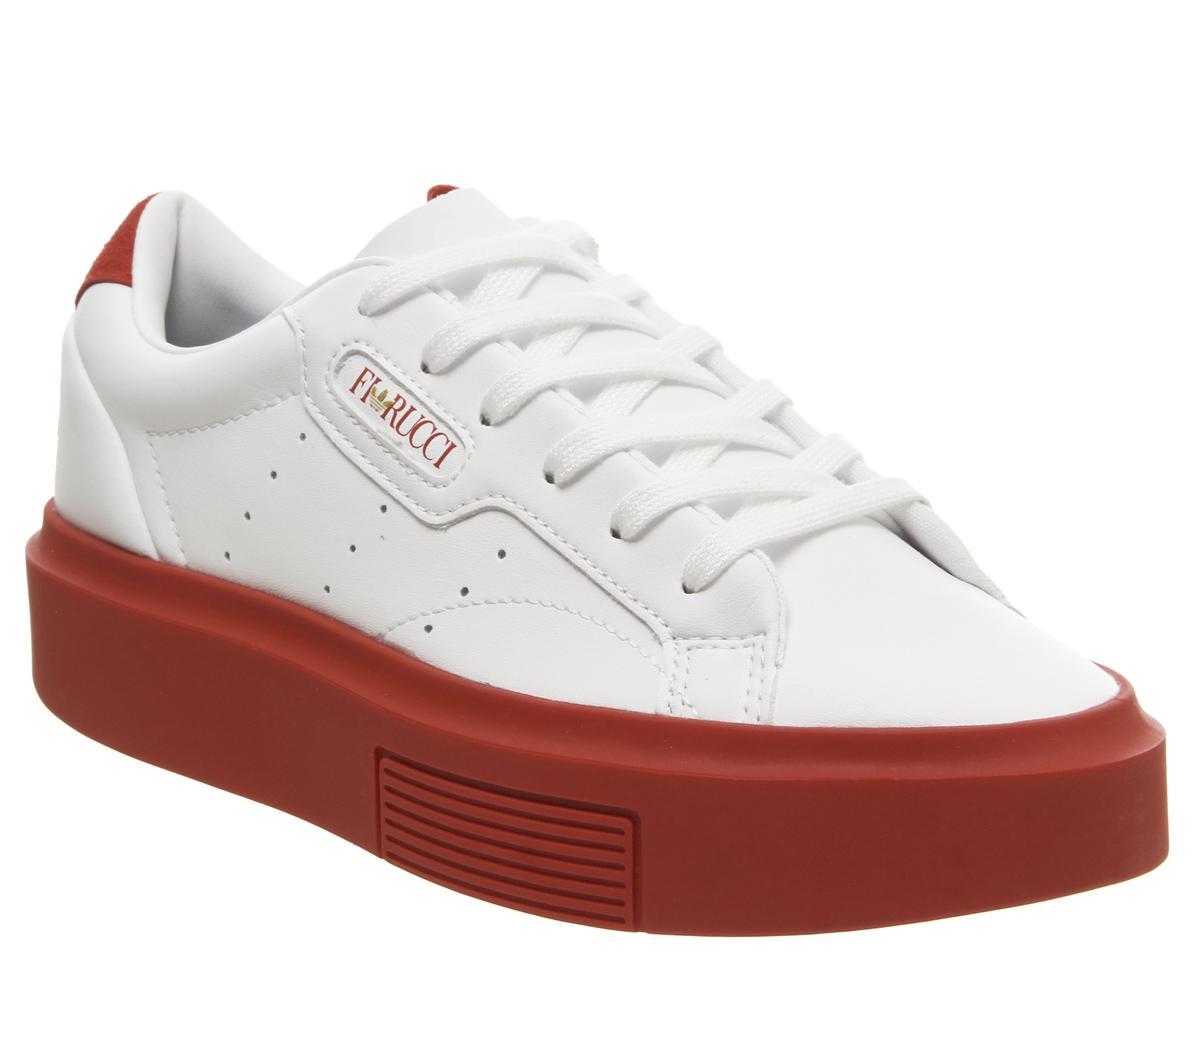 adidas Sleek Super Trainers White Red